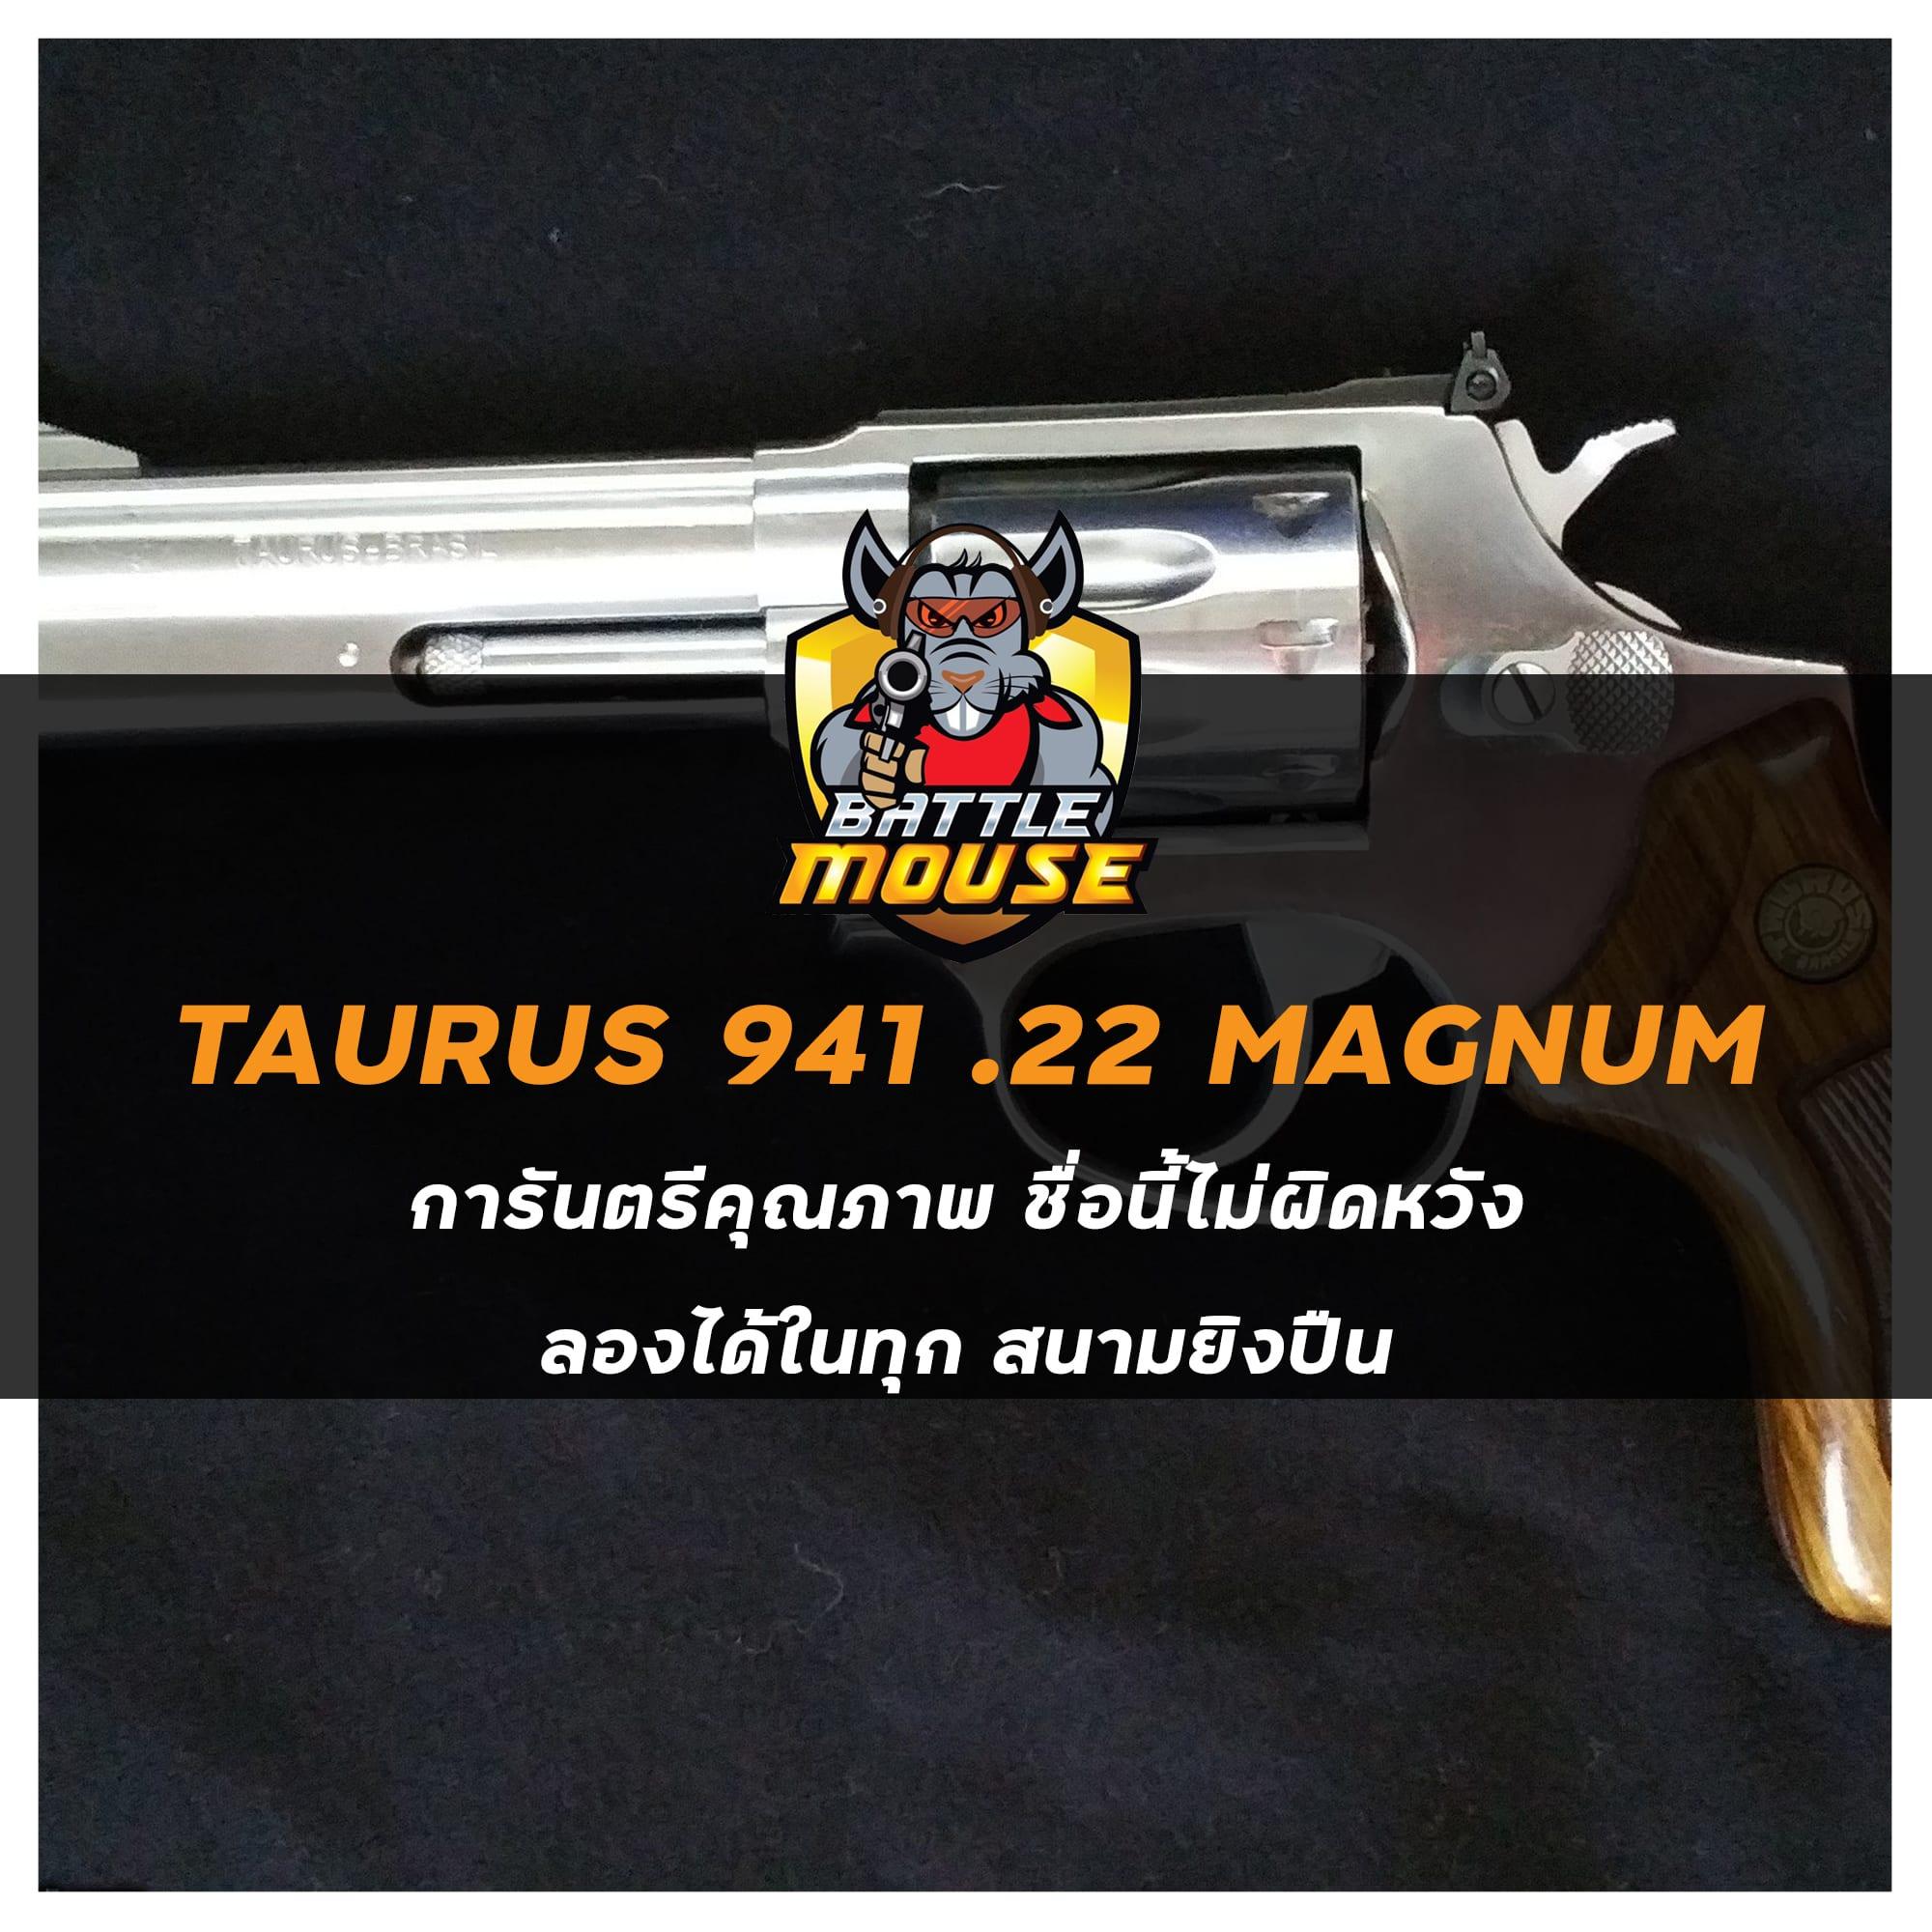 TAURUS 941 .22 MAGNU การันตรีคุณภาพ ชื่อนี้ไม่ผิดหวัง ลองได้ในทุก สนามยิงปืน